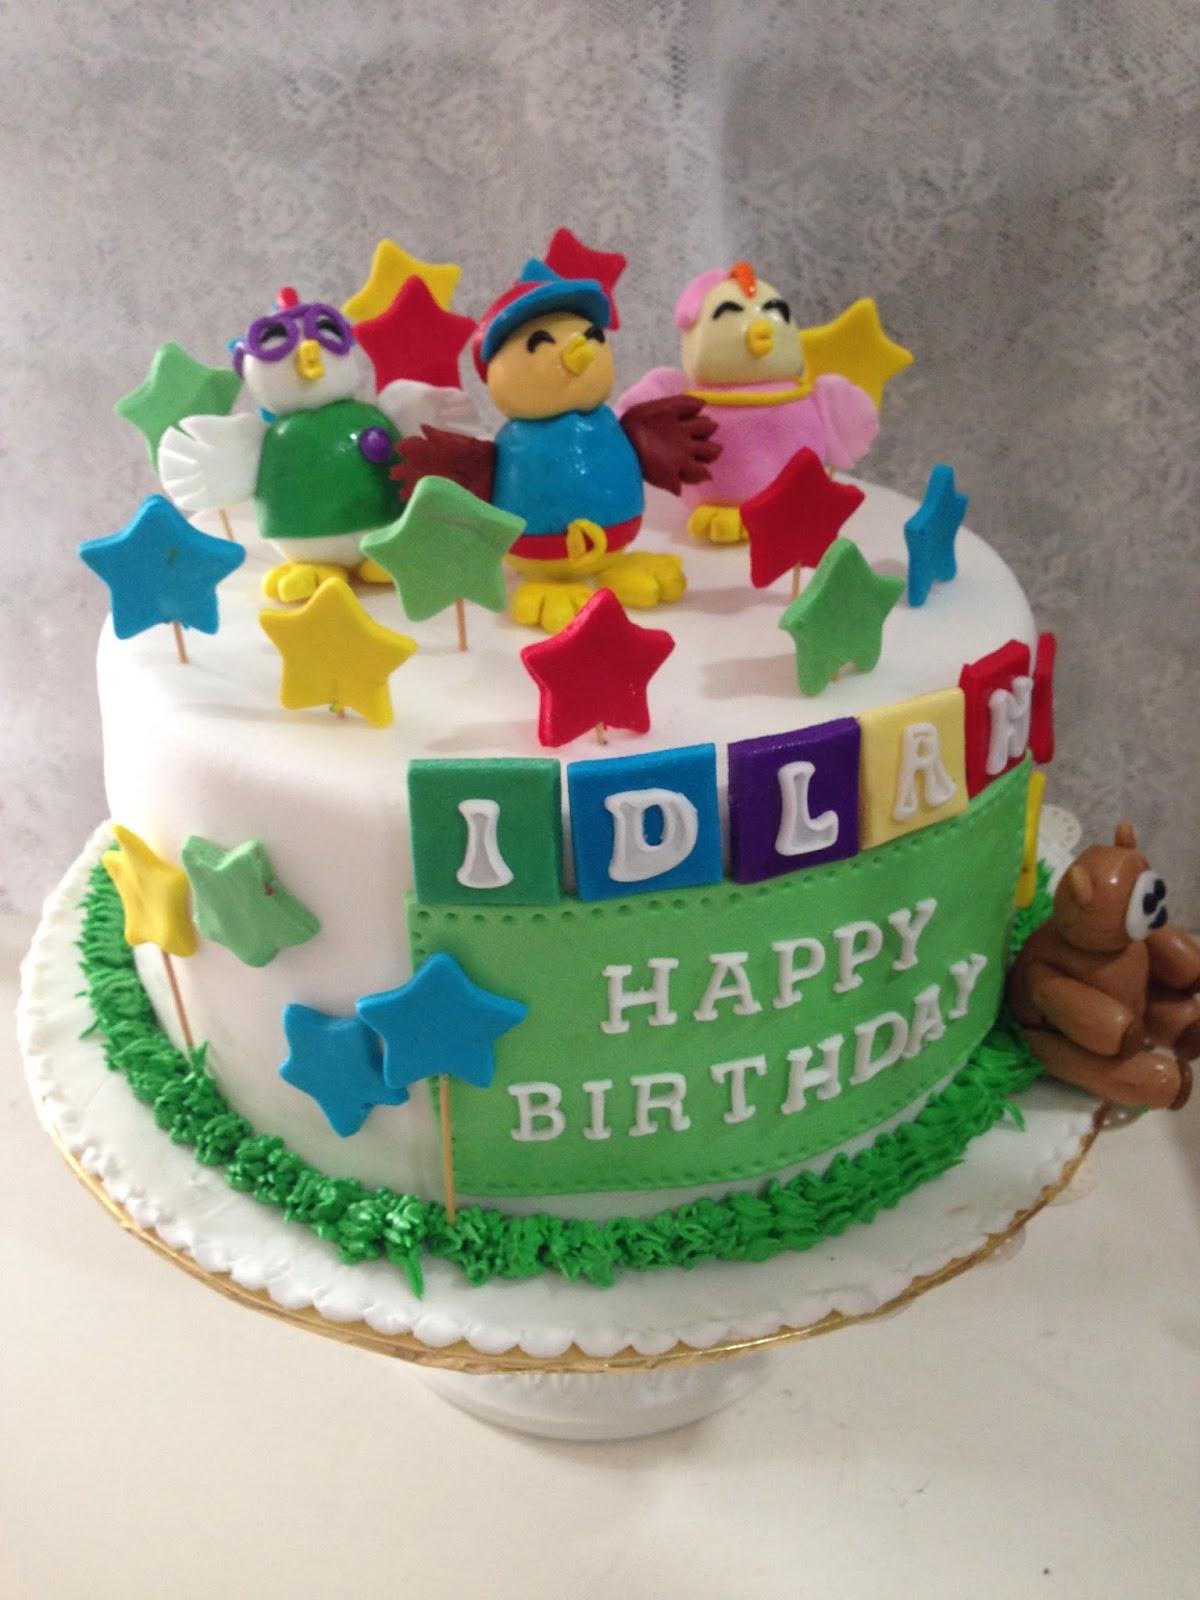 ninie cakes house: Didi and Friends Fondant Cake